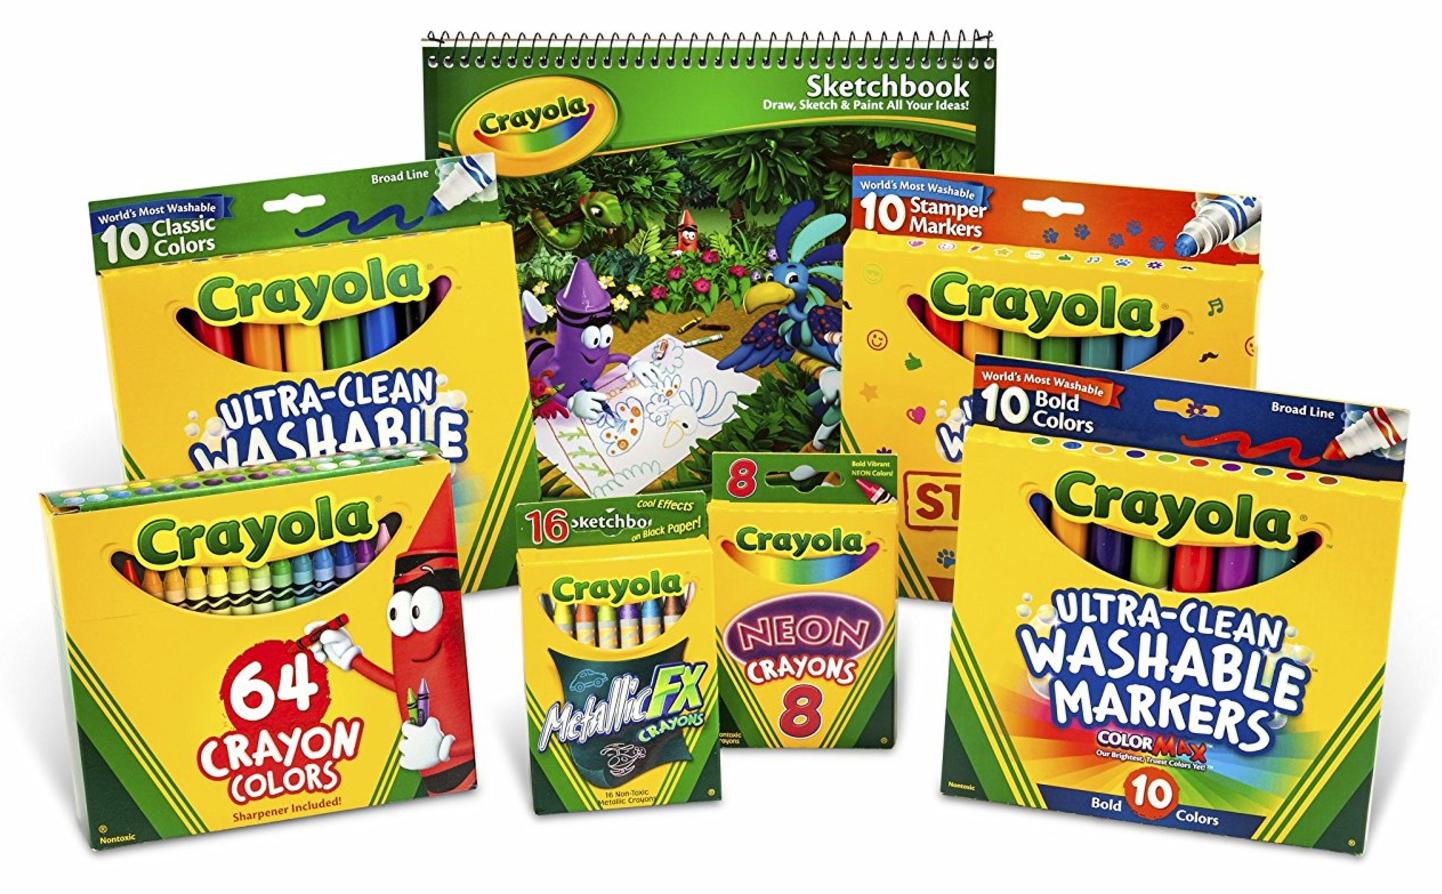 Crayola Crayon And Crayola Ultraclean Washable Marker Kit, BEST ...